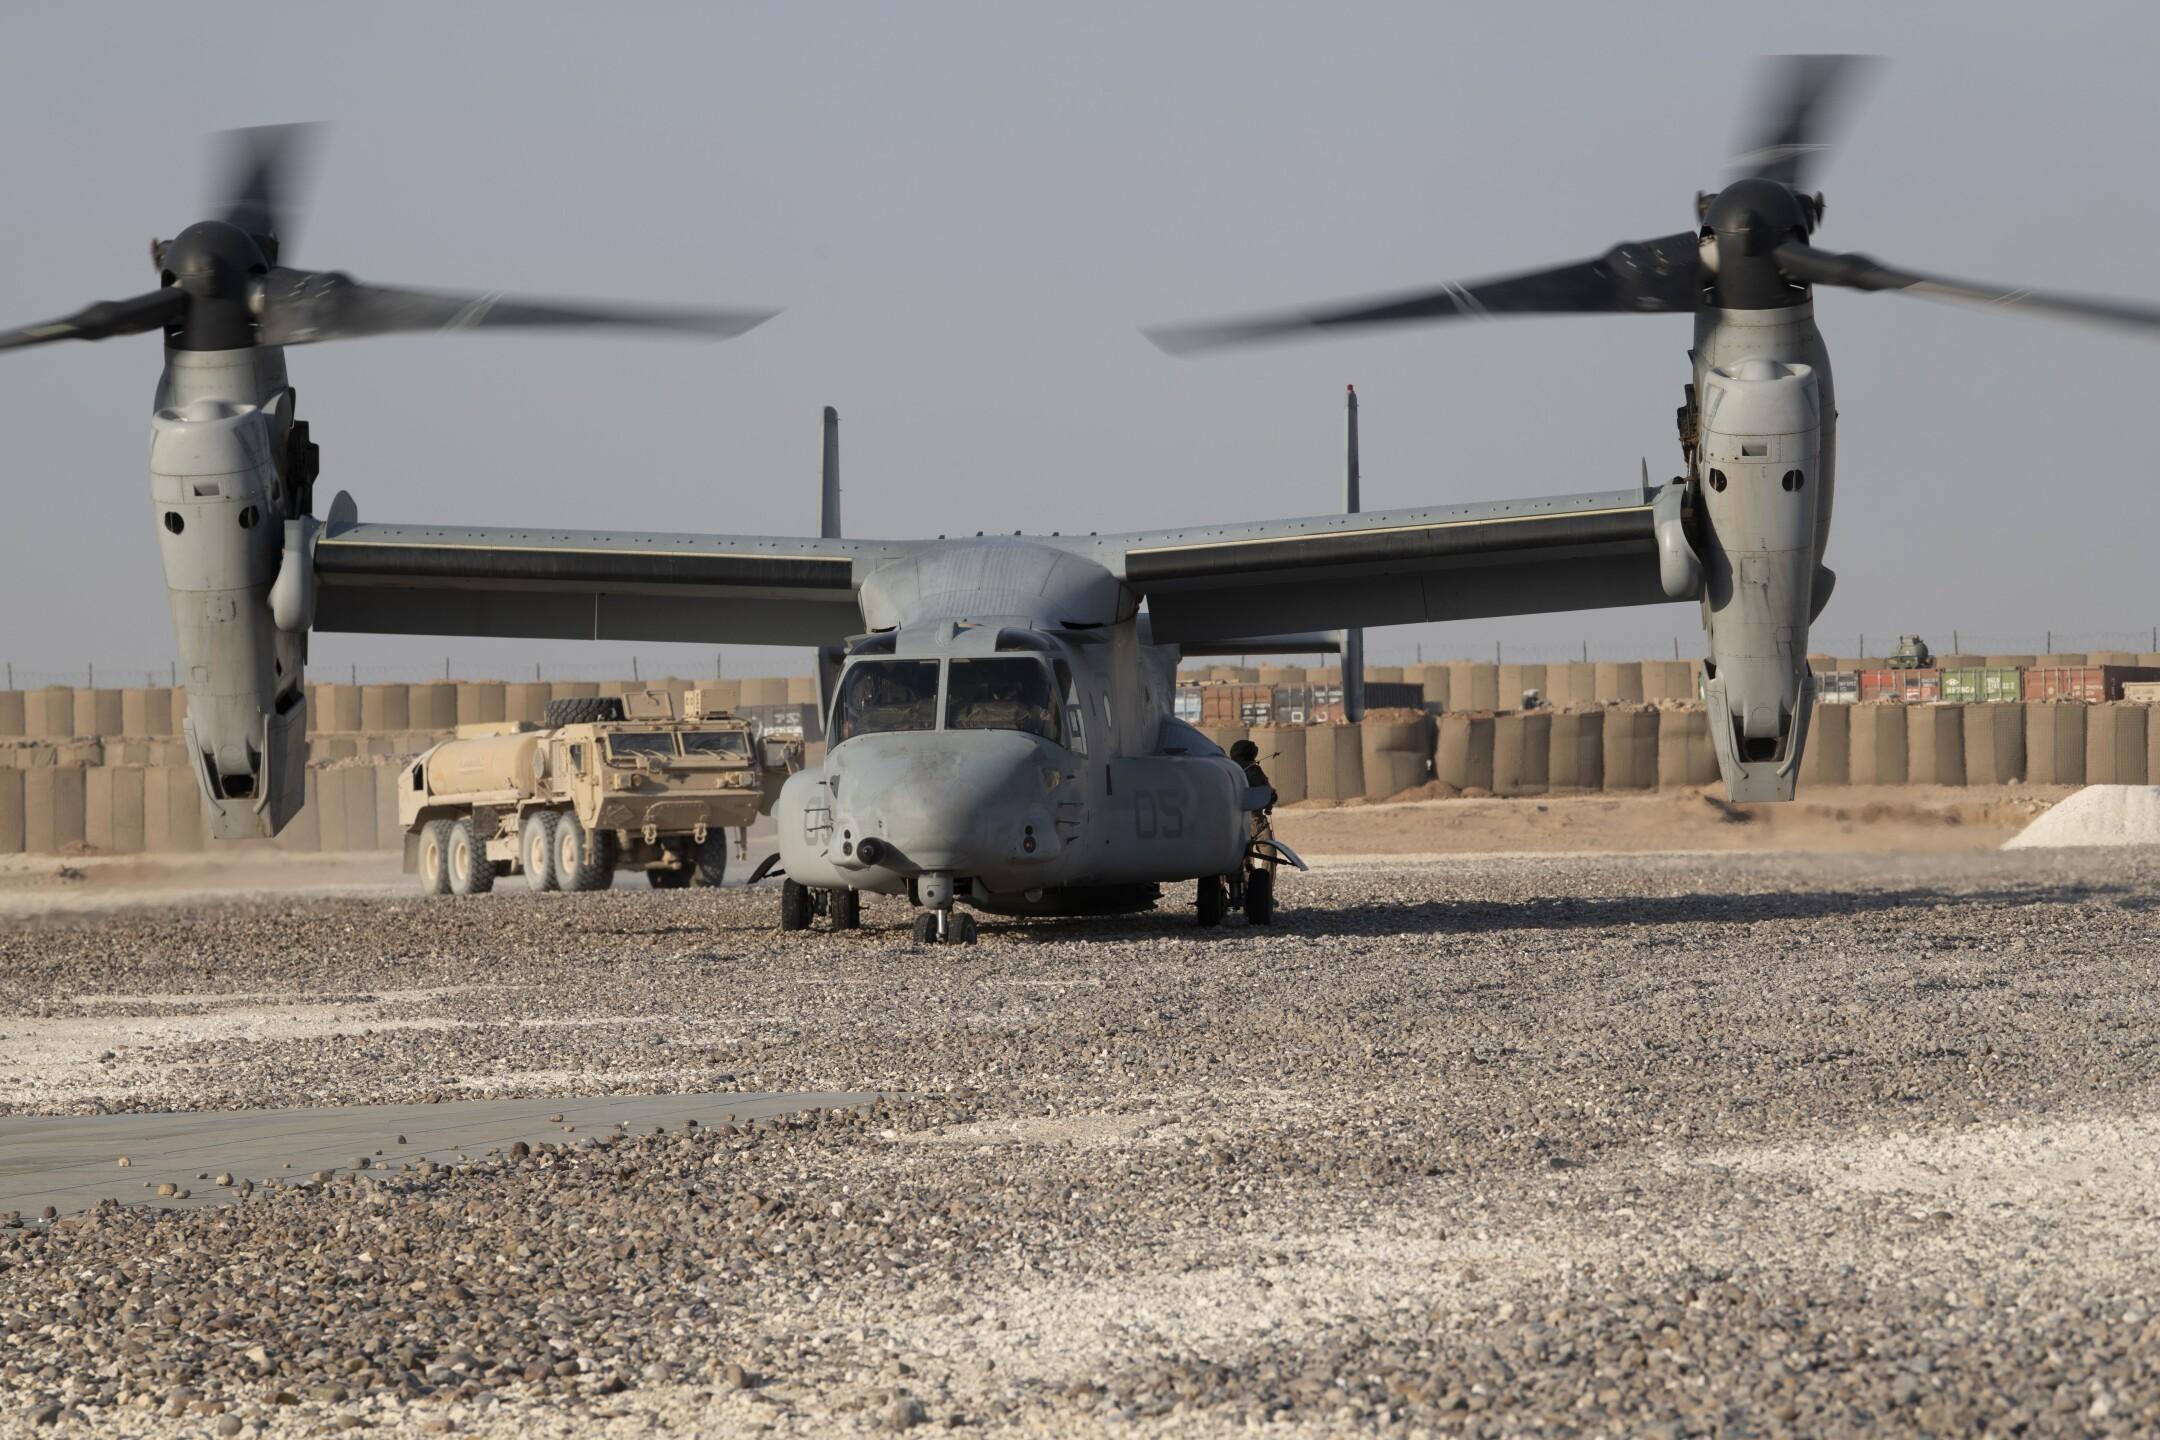 Ospreys refuel